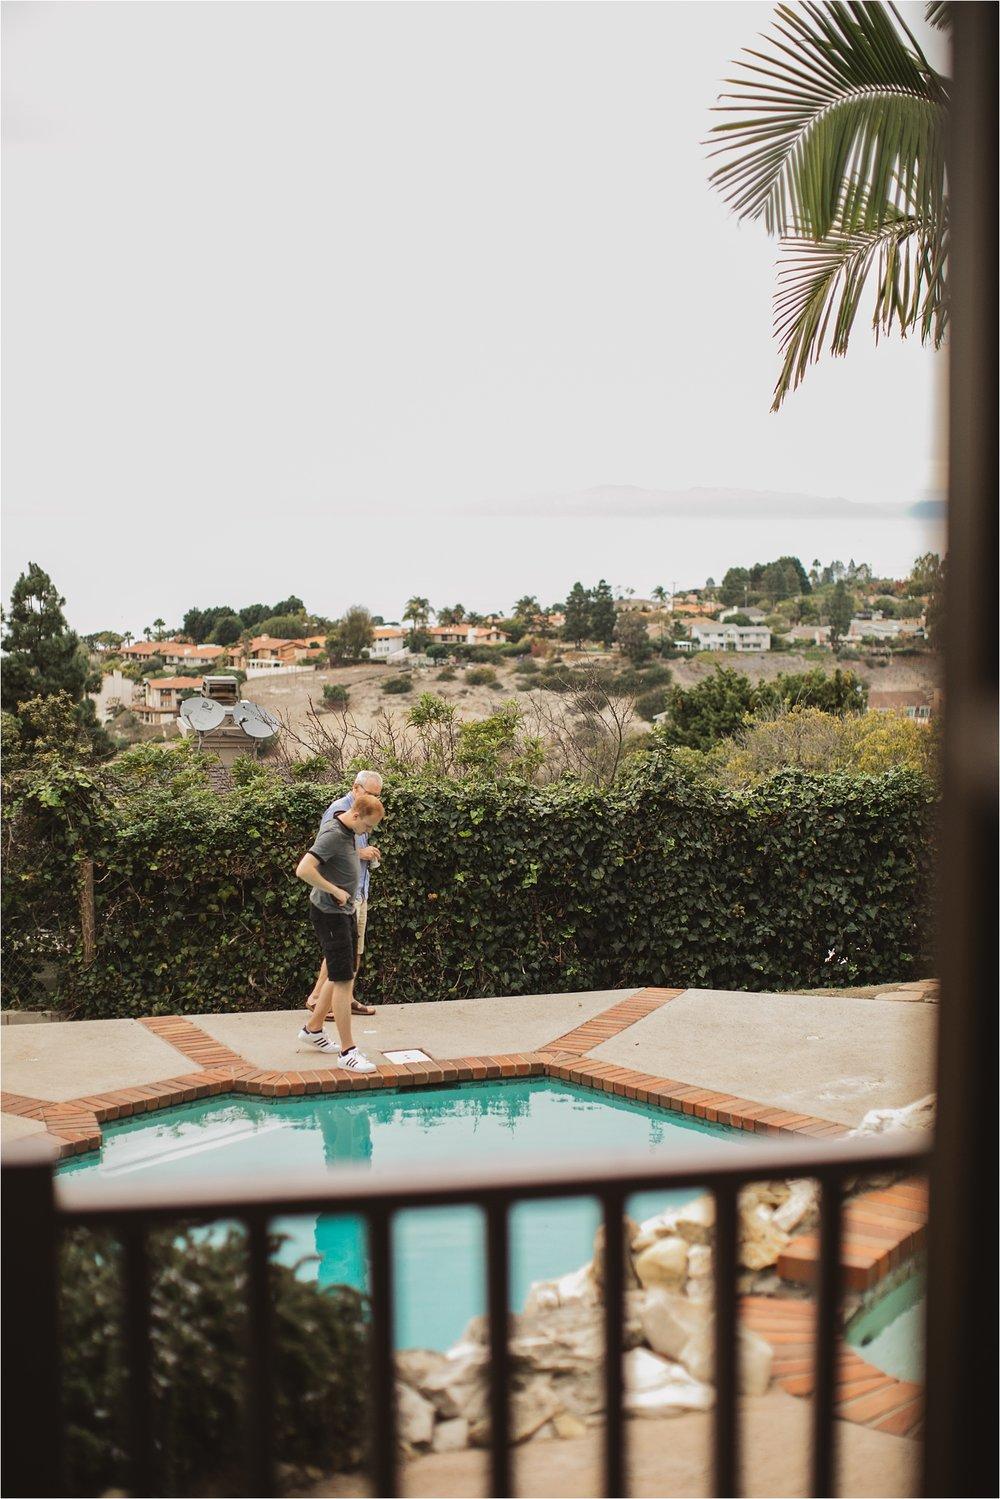 kevin_baird_paige_lawedding_destination_terranea_resort_california_0341.jpg